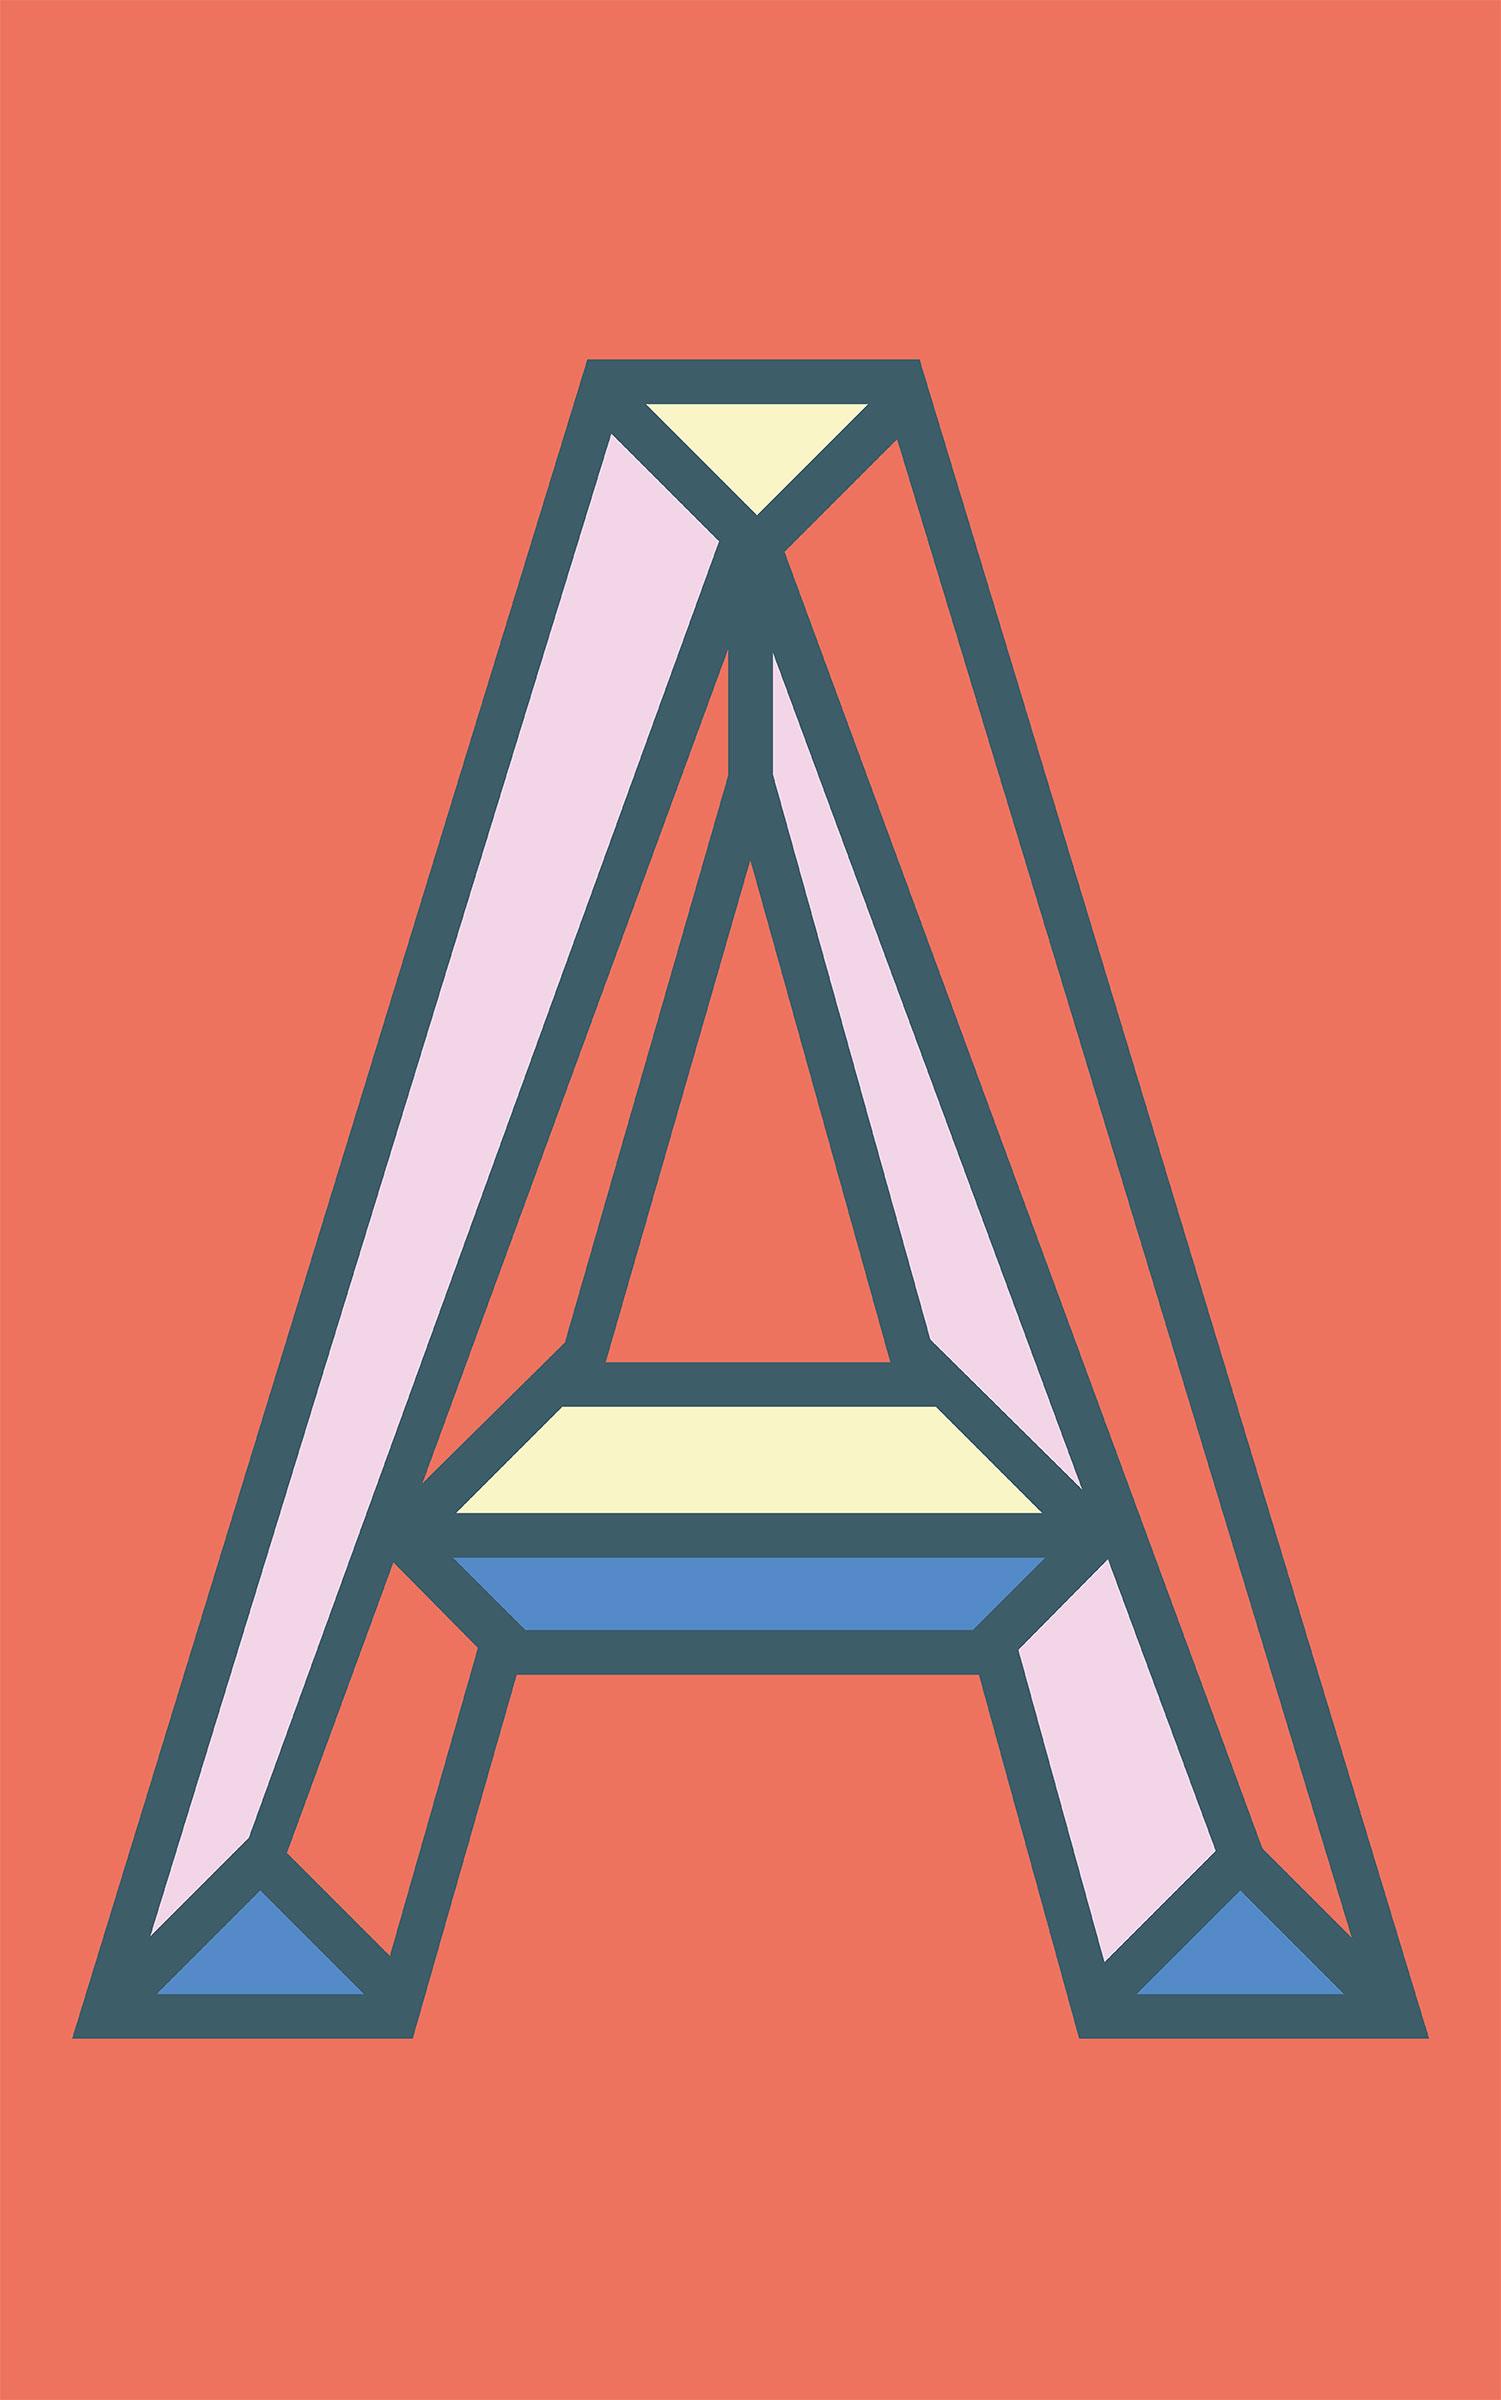 randaberg-alphabet-project-thumb-web.jpg